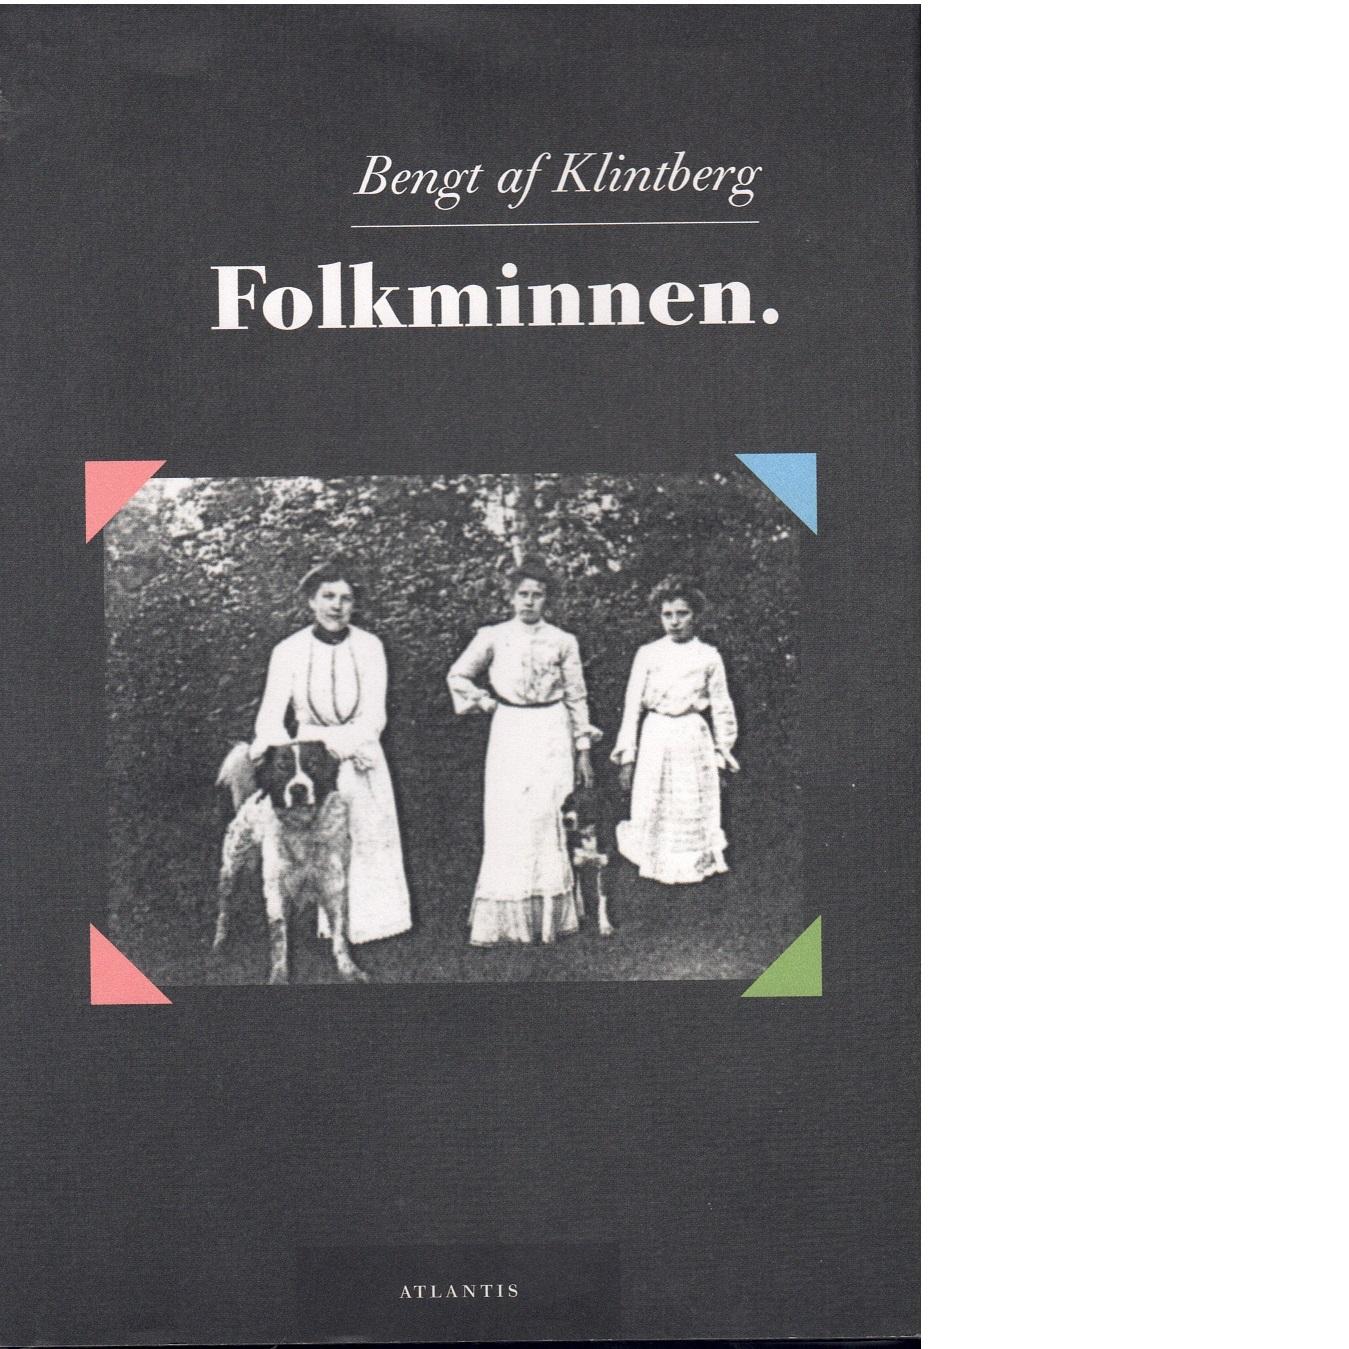 Folkminnen - Klintberg, Bengt af